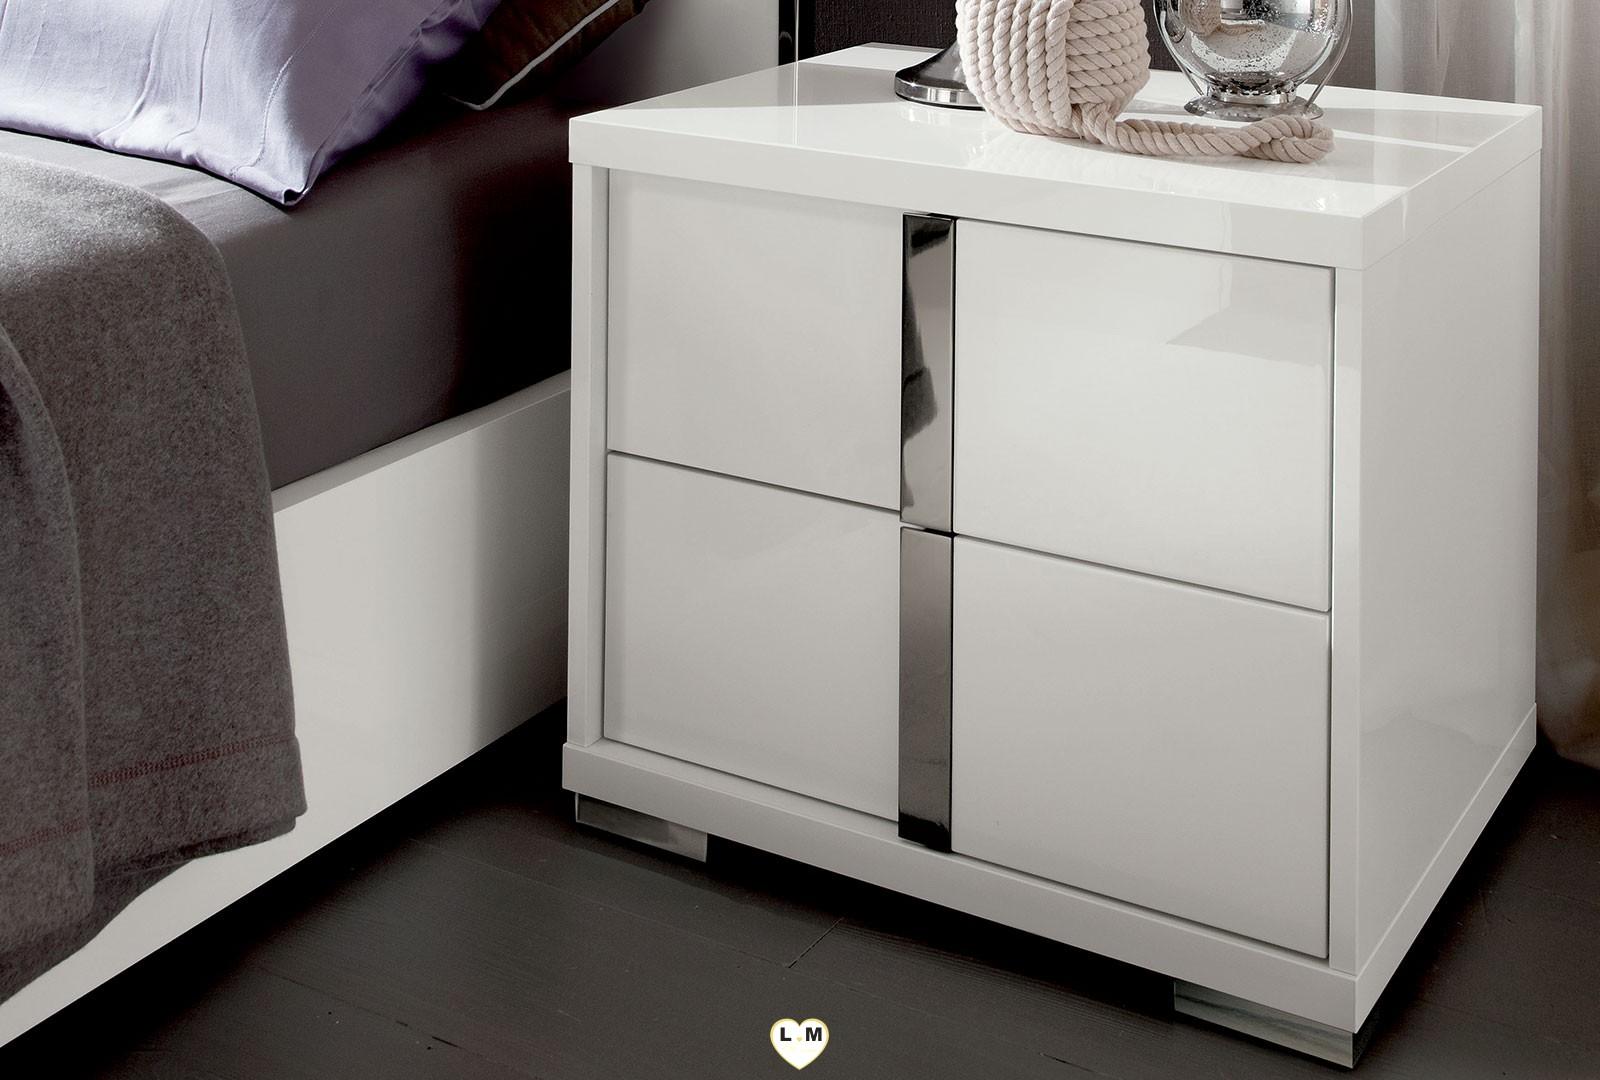 table de chevet laque blanc brillant gallery of gallery. Black Bedroom Furniture Sets. Home Design Ideas